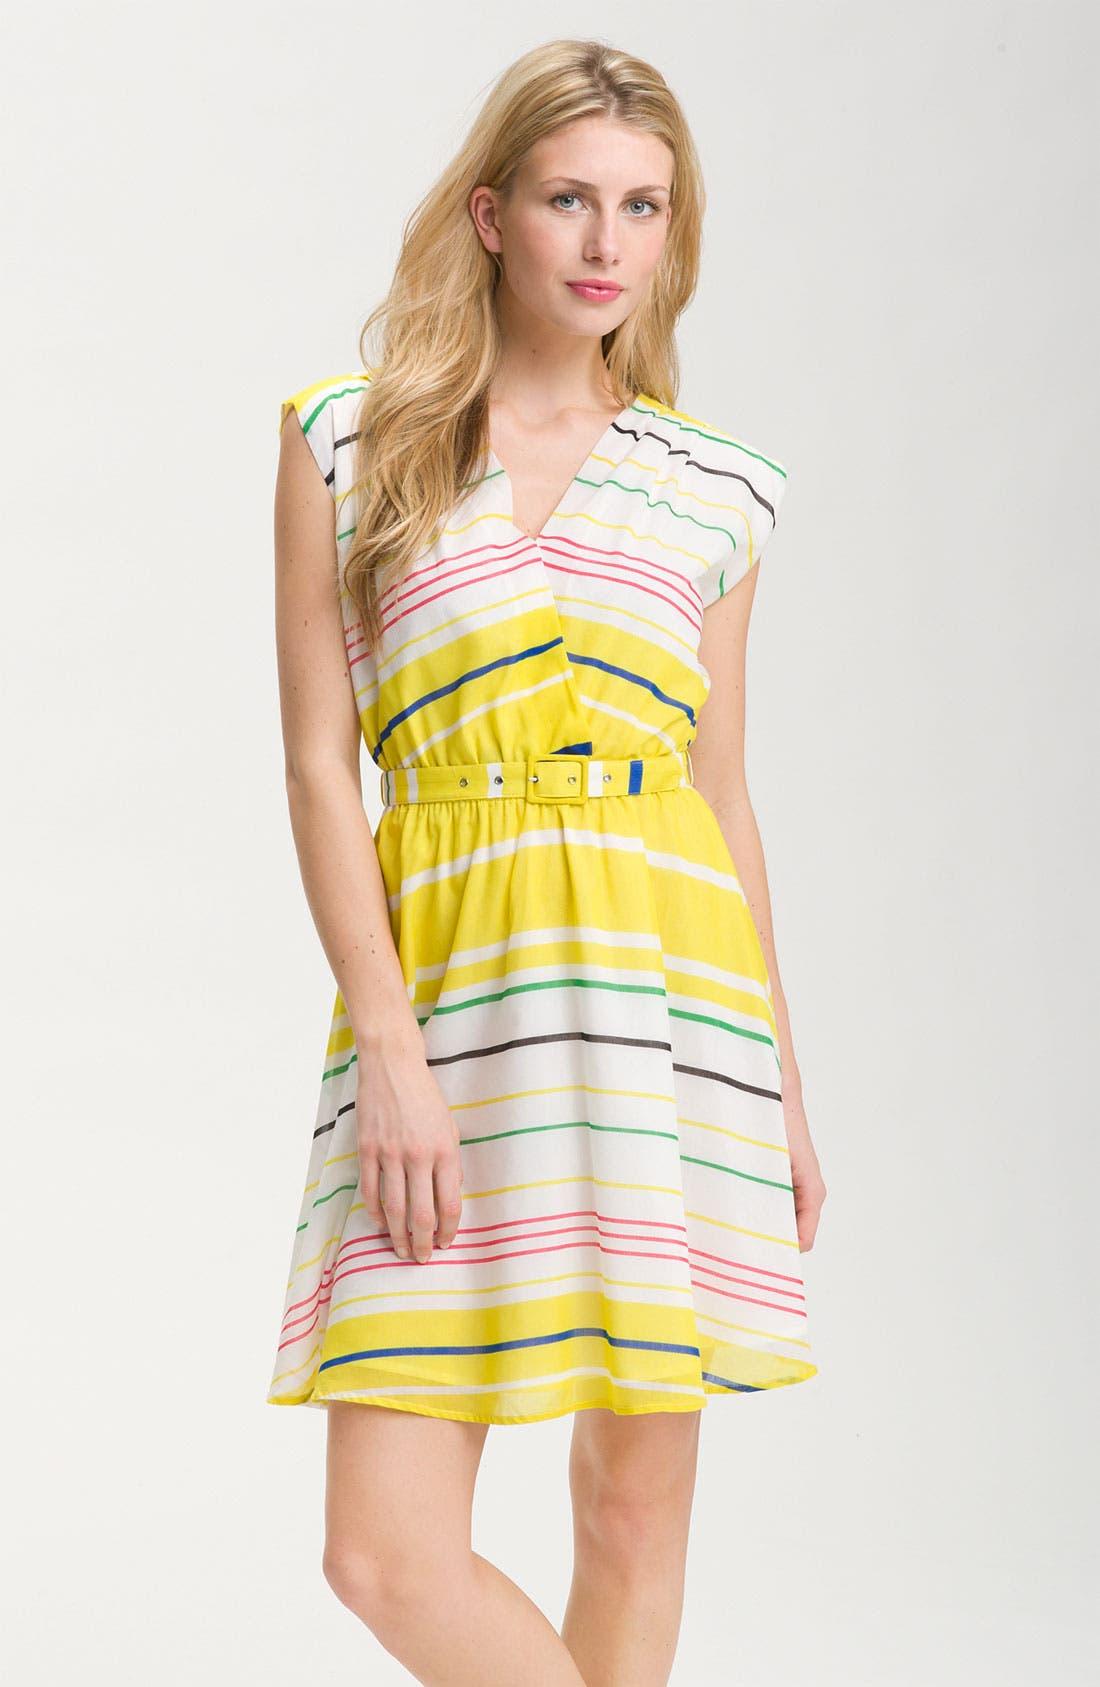 Alternate Image 1 Selected - Presley Skye 'Sloane' Belted Stripe Dress